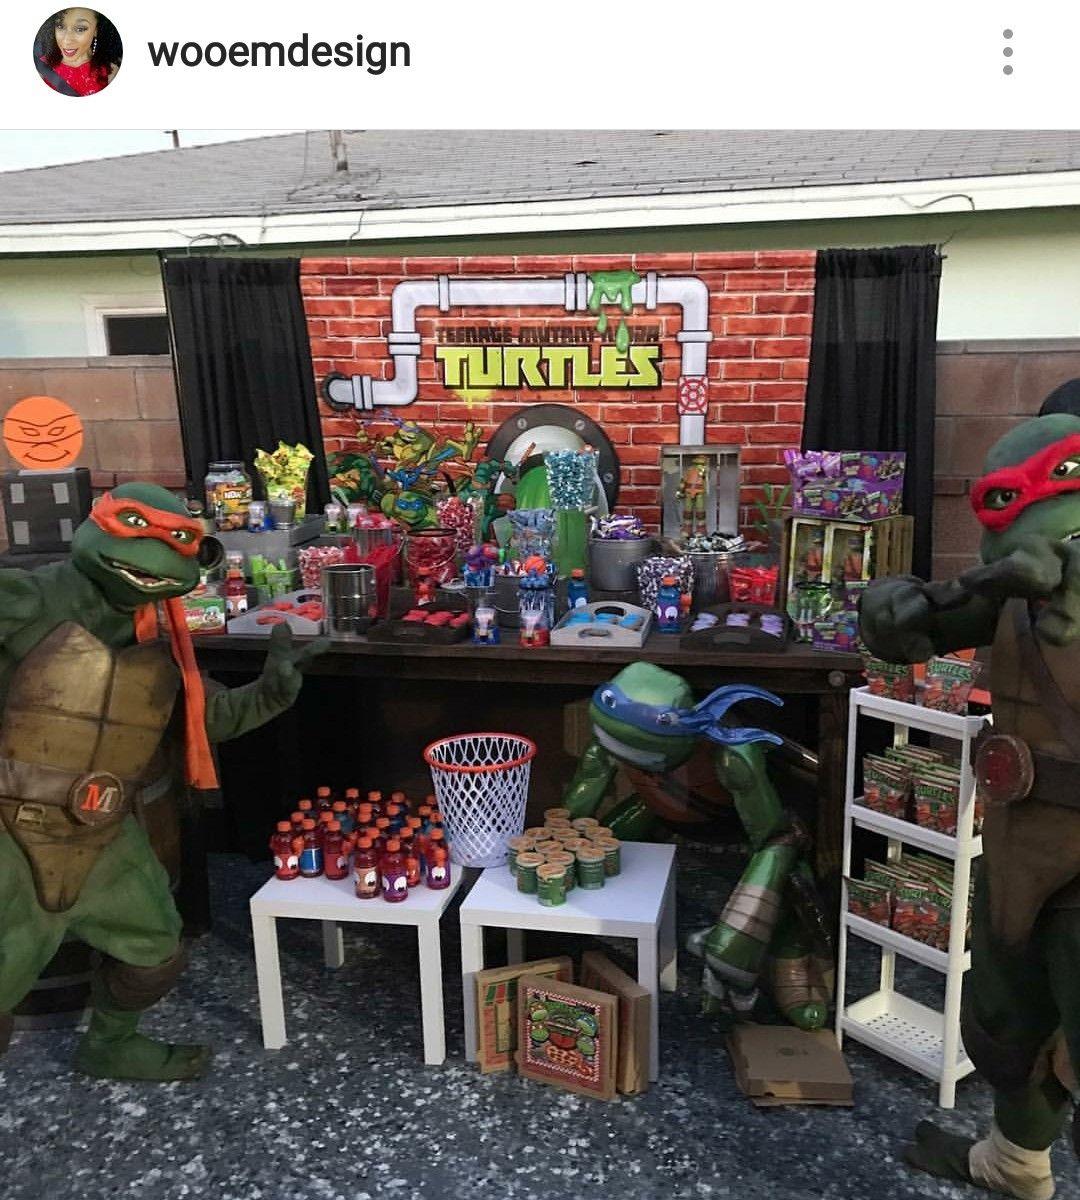 Teenage Mutant Ninja Turtles Inspired Outdoor Birthday Party Outdoors Birthday Party Ninja Turtle Birthday Kids Party Themes